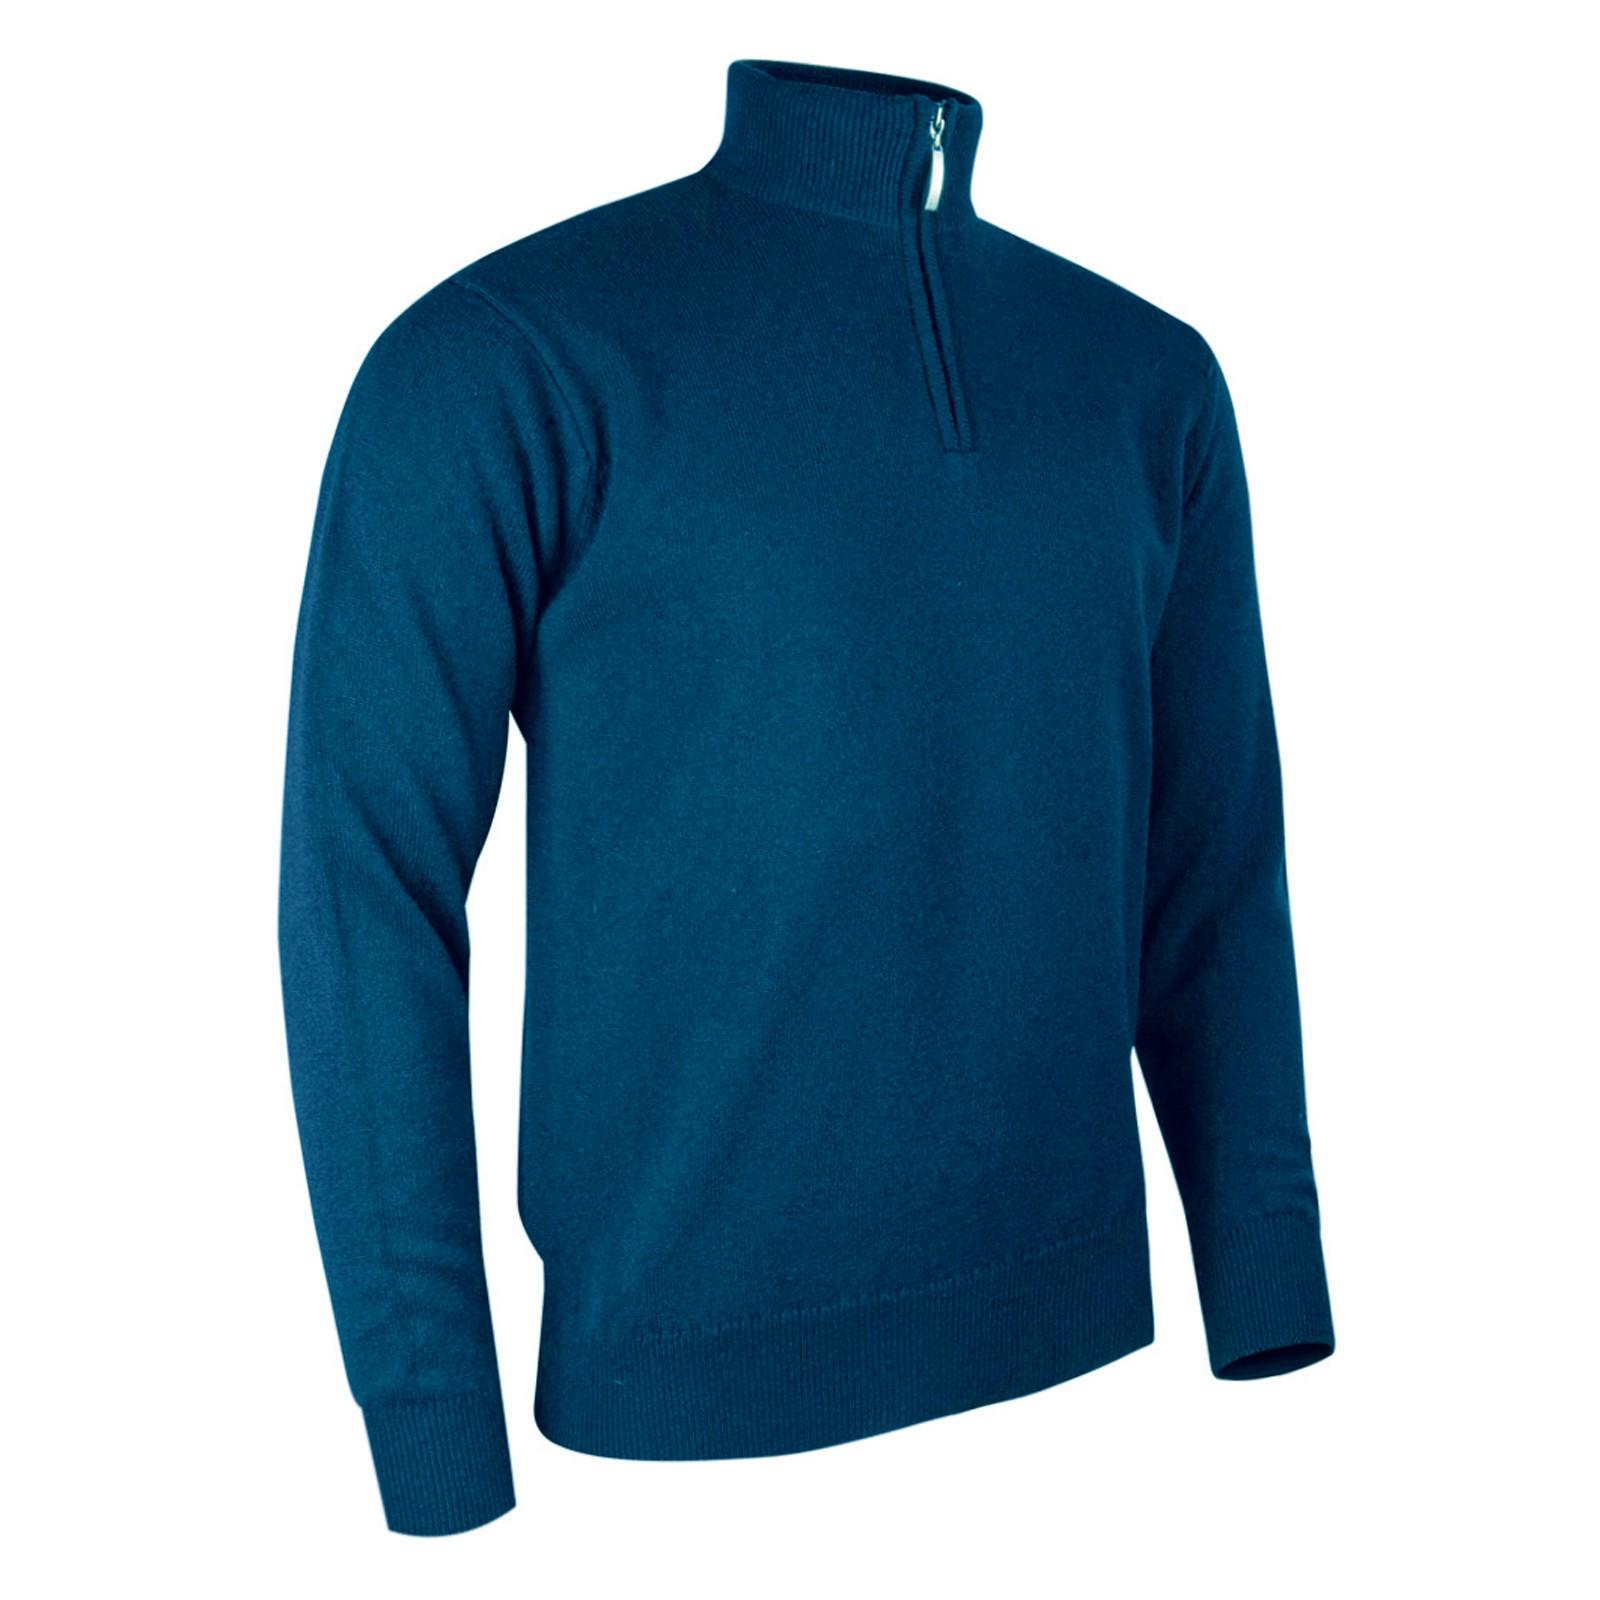 Glenmuir Coll 1/4 Zip Sweaters